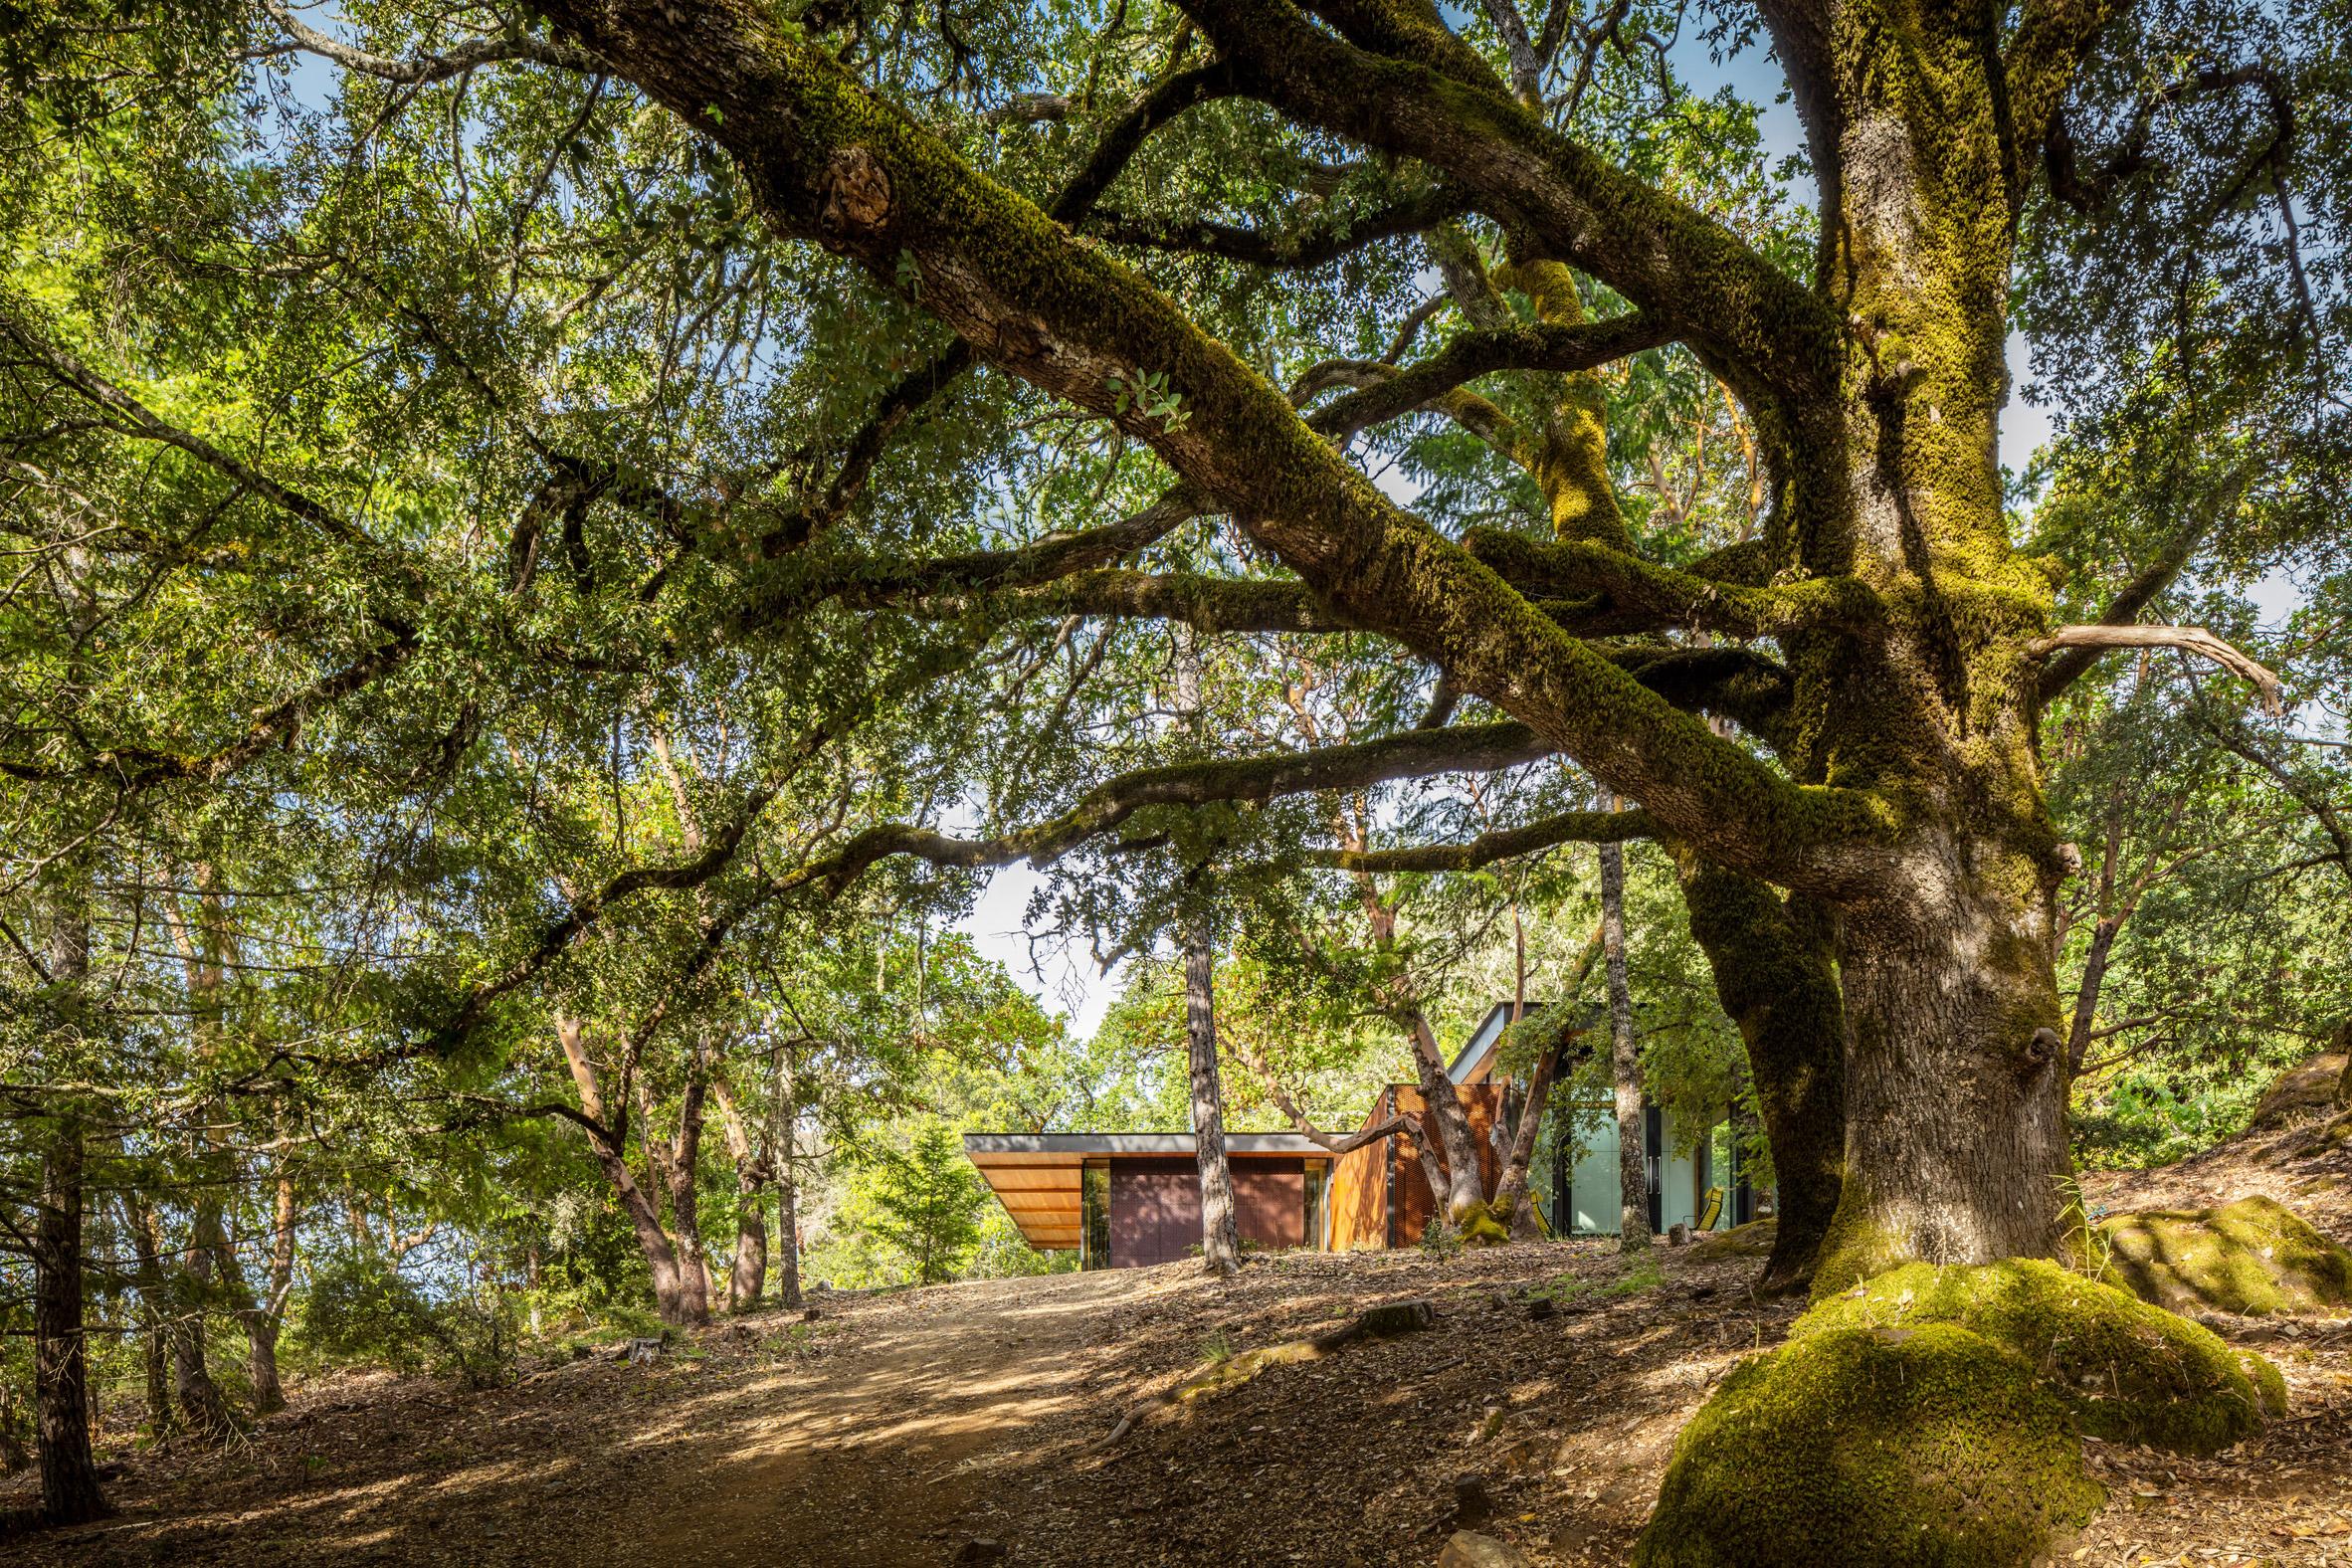 High Horse Ranch by Kieran Timberlake